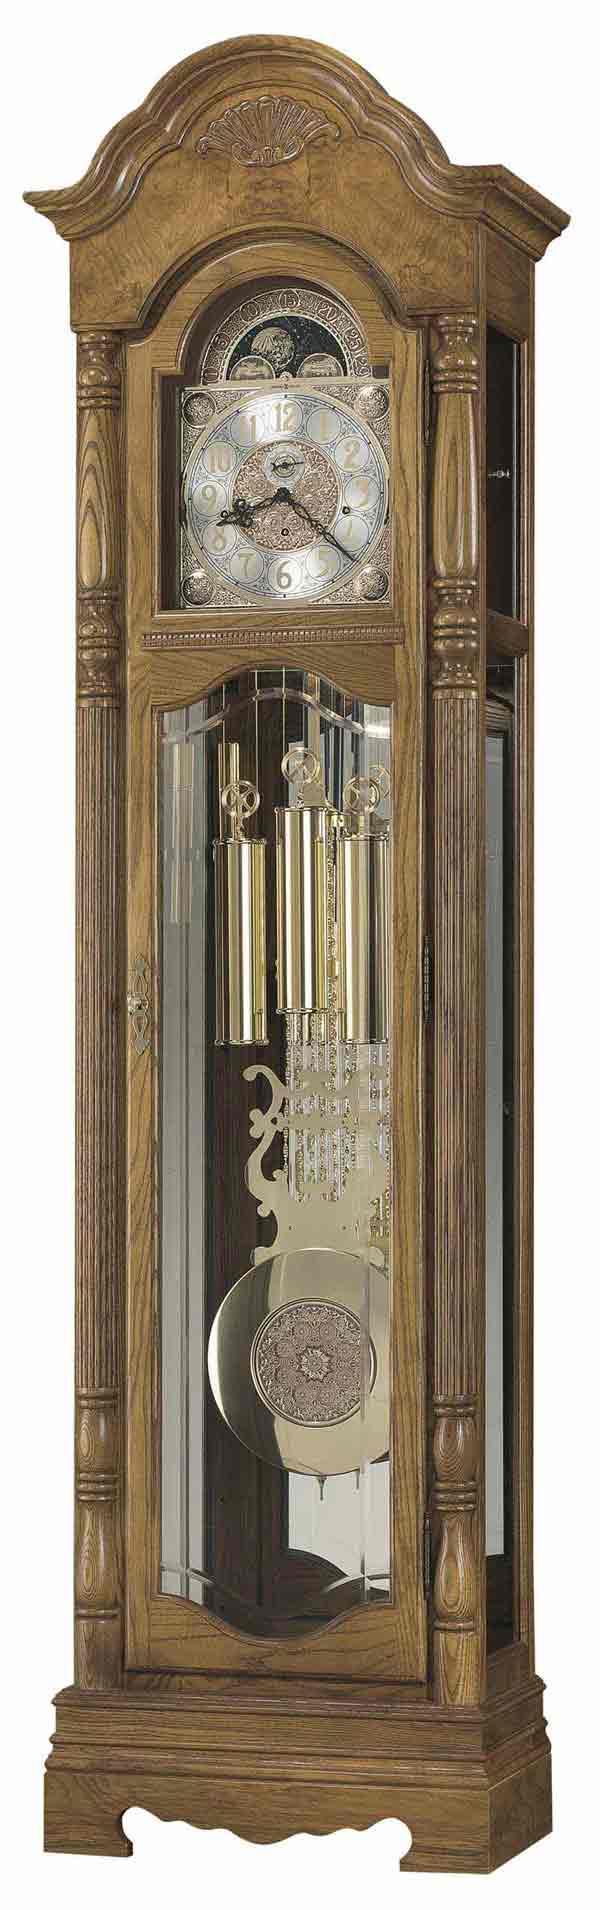 Howard Miller Browman 611 202 Grandfather Clock